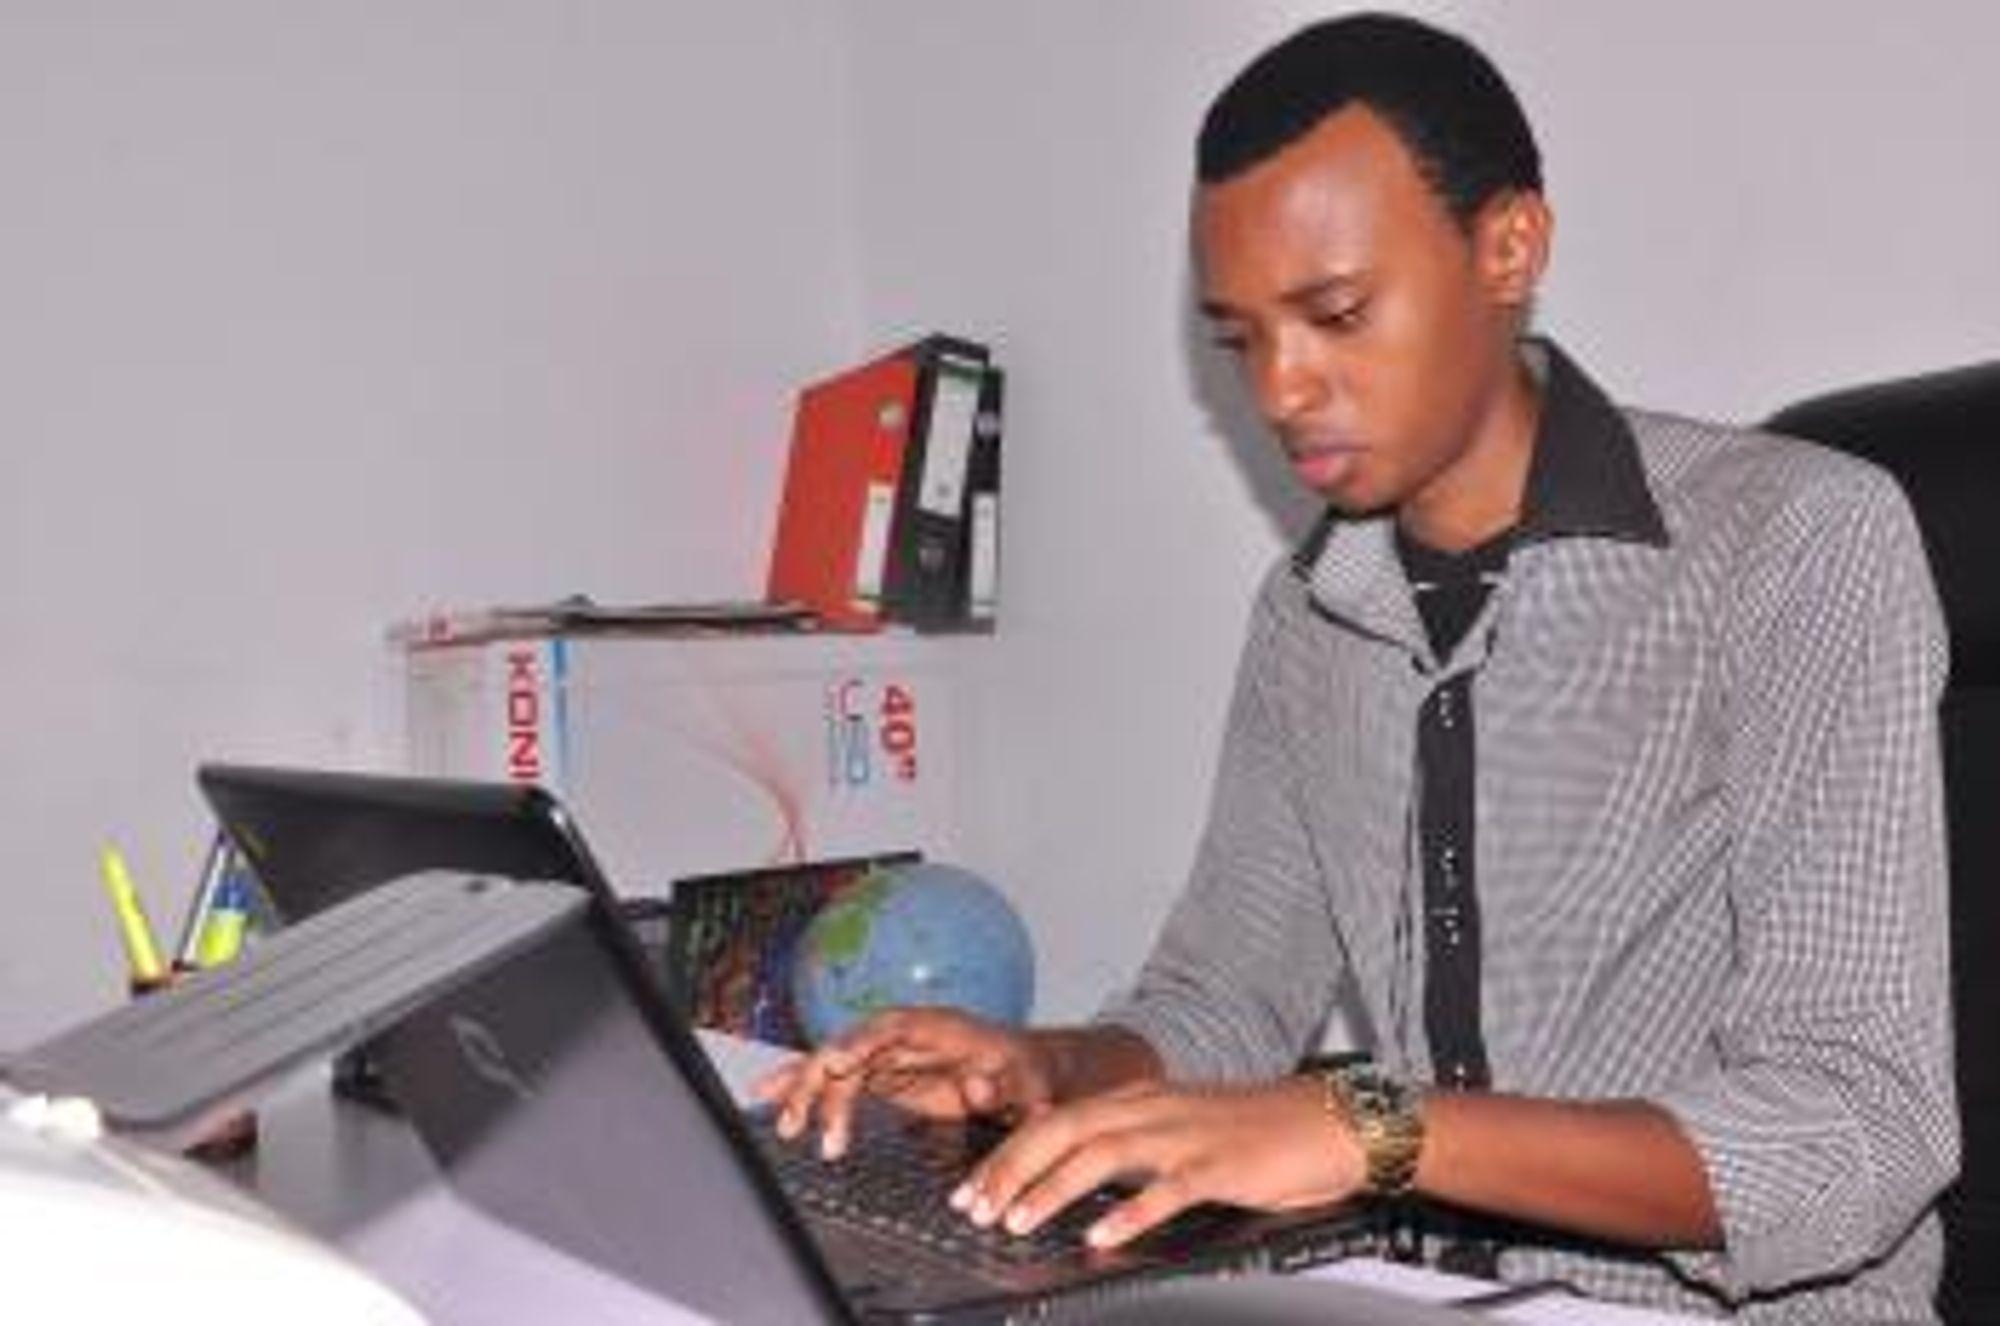 Alain var 14 år da han startet sin lille IT-bedrift. Foto:Ms Rose Lyadede.